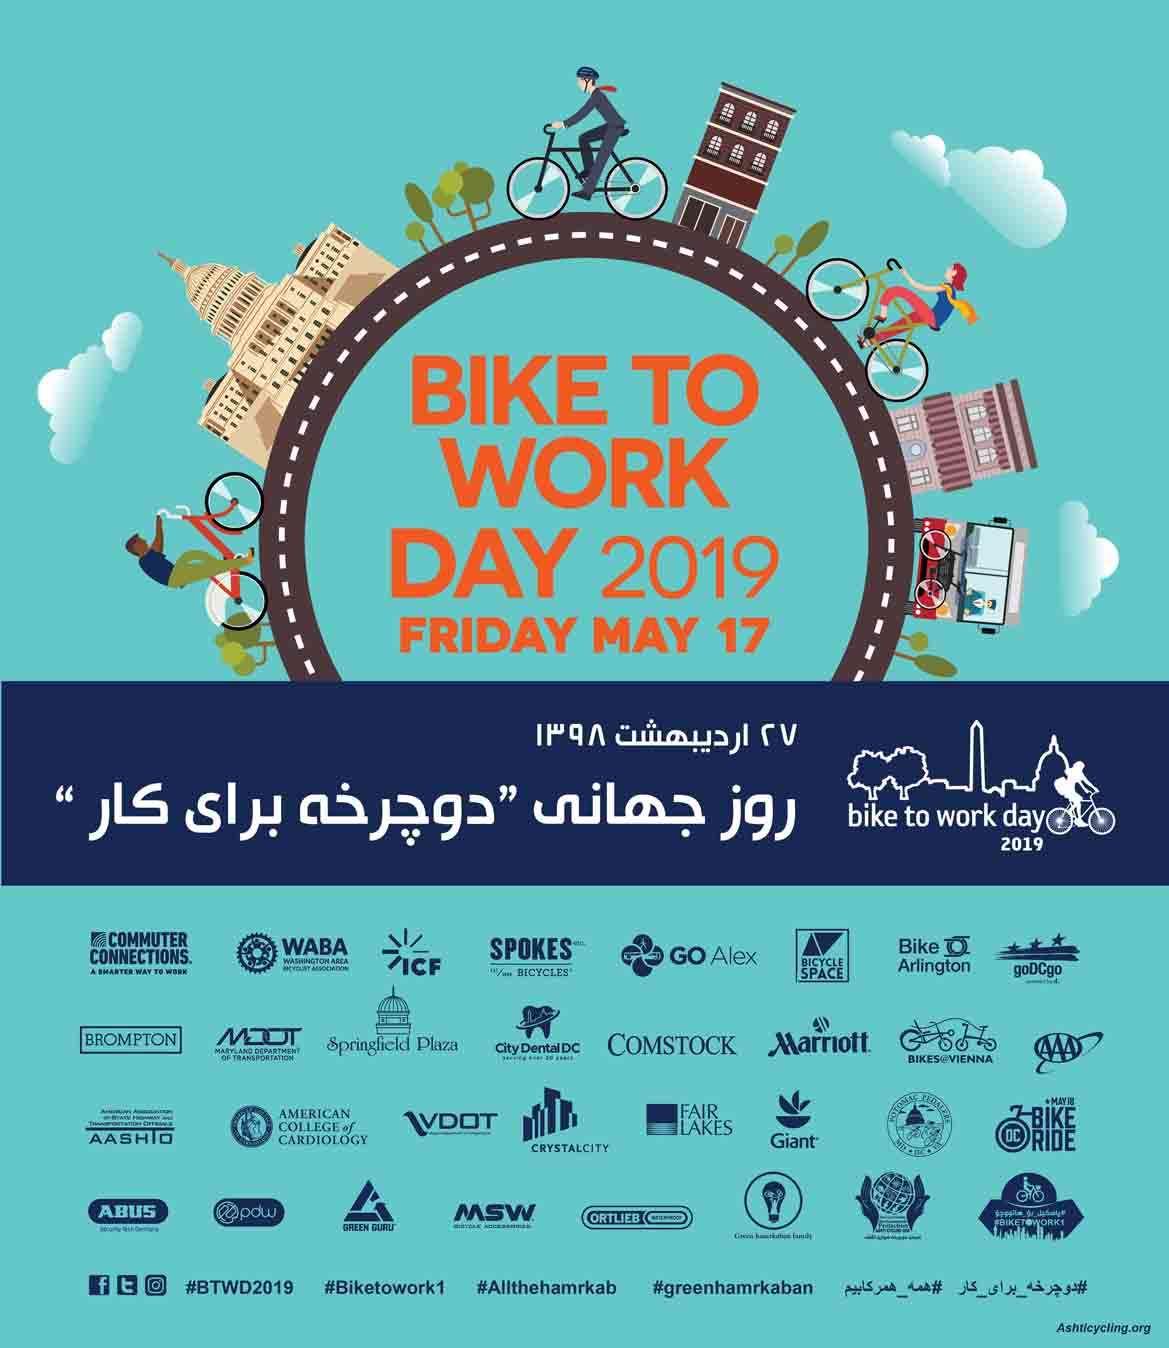 Bike to work day10